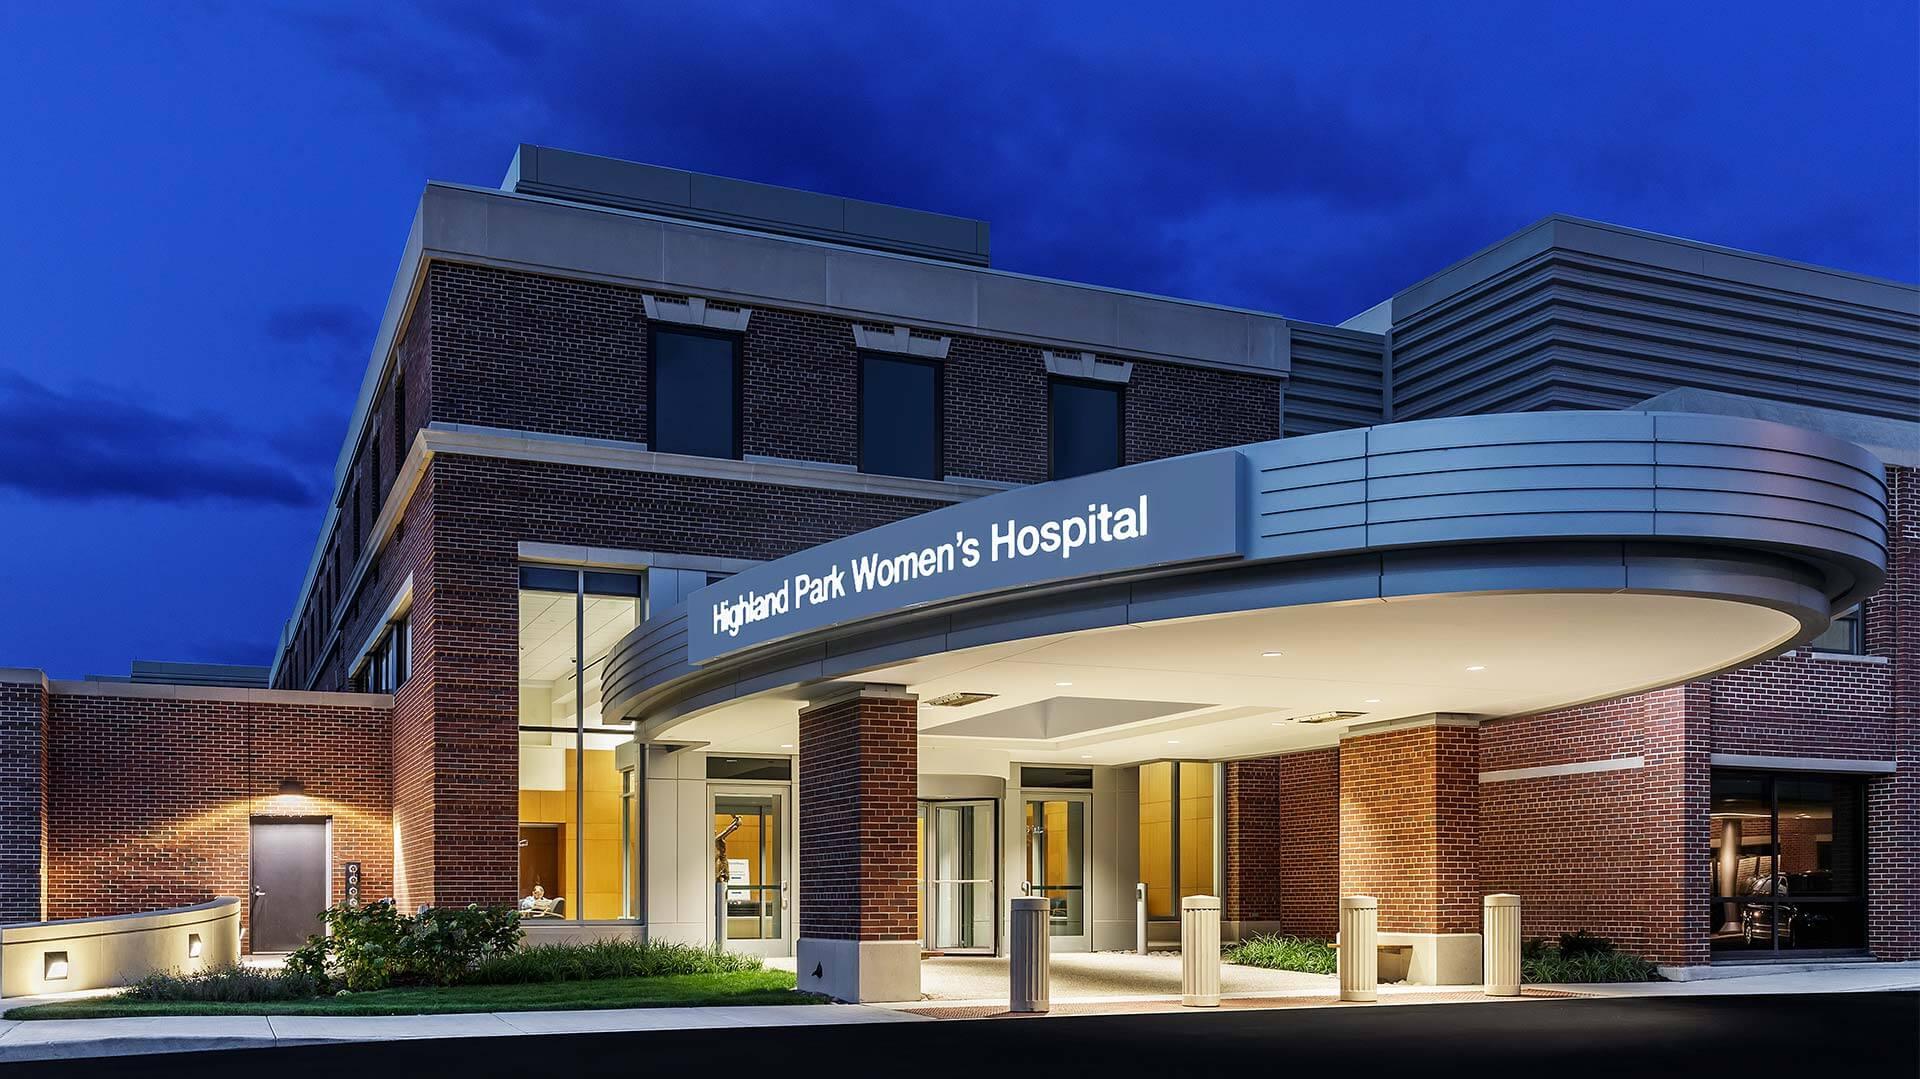 Highland Park Women's Hospital